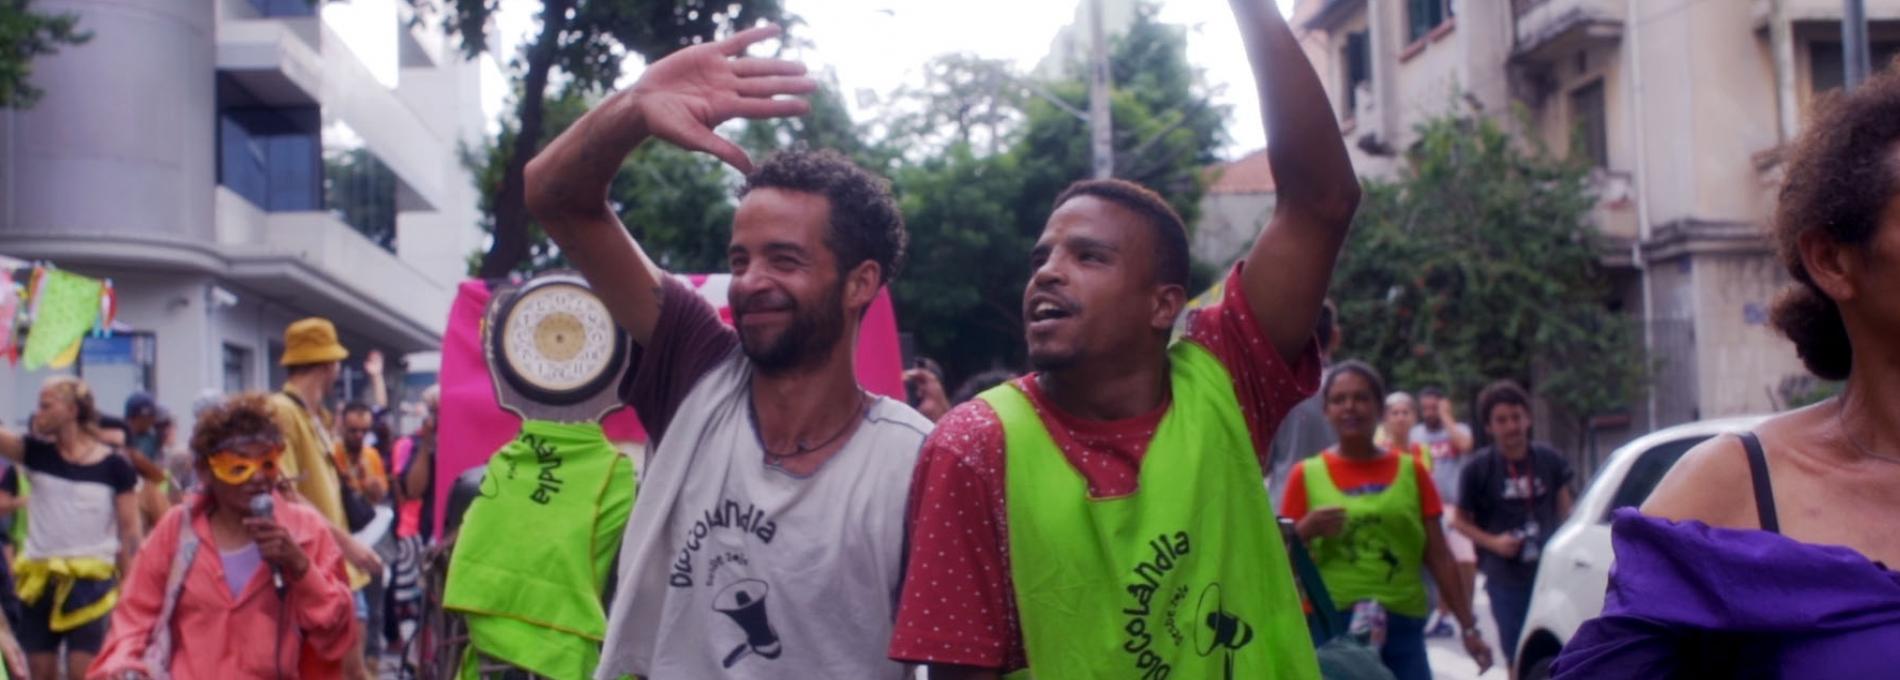 Blocolândia, o bloco de carnaval da Cracolândia